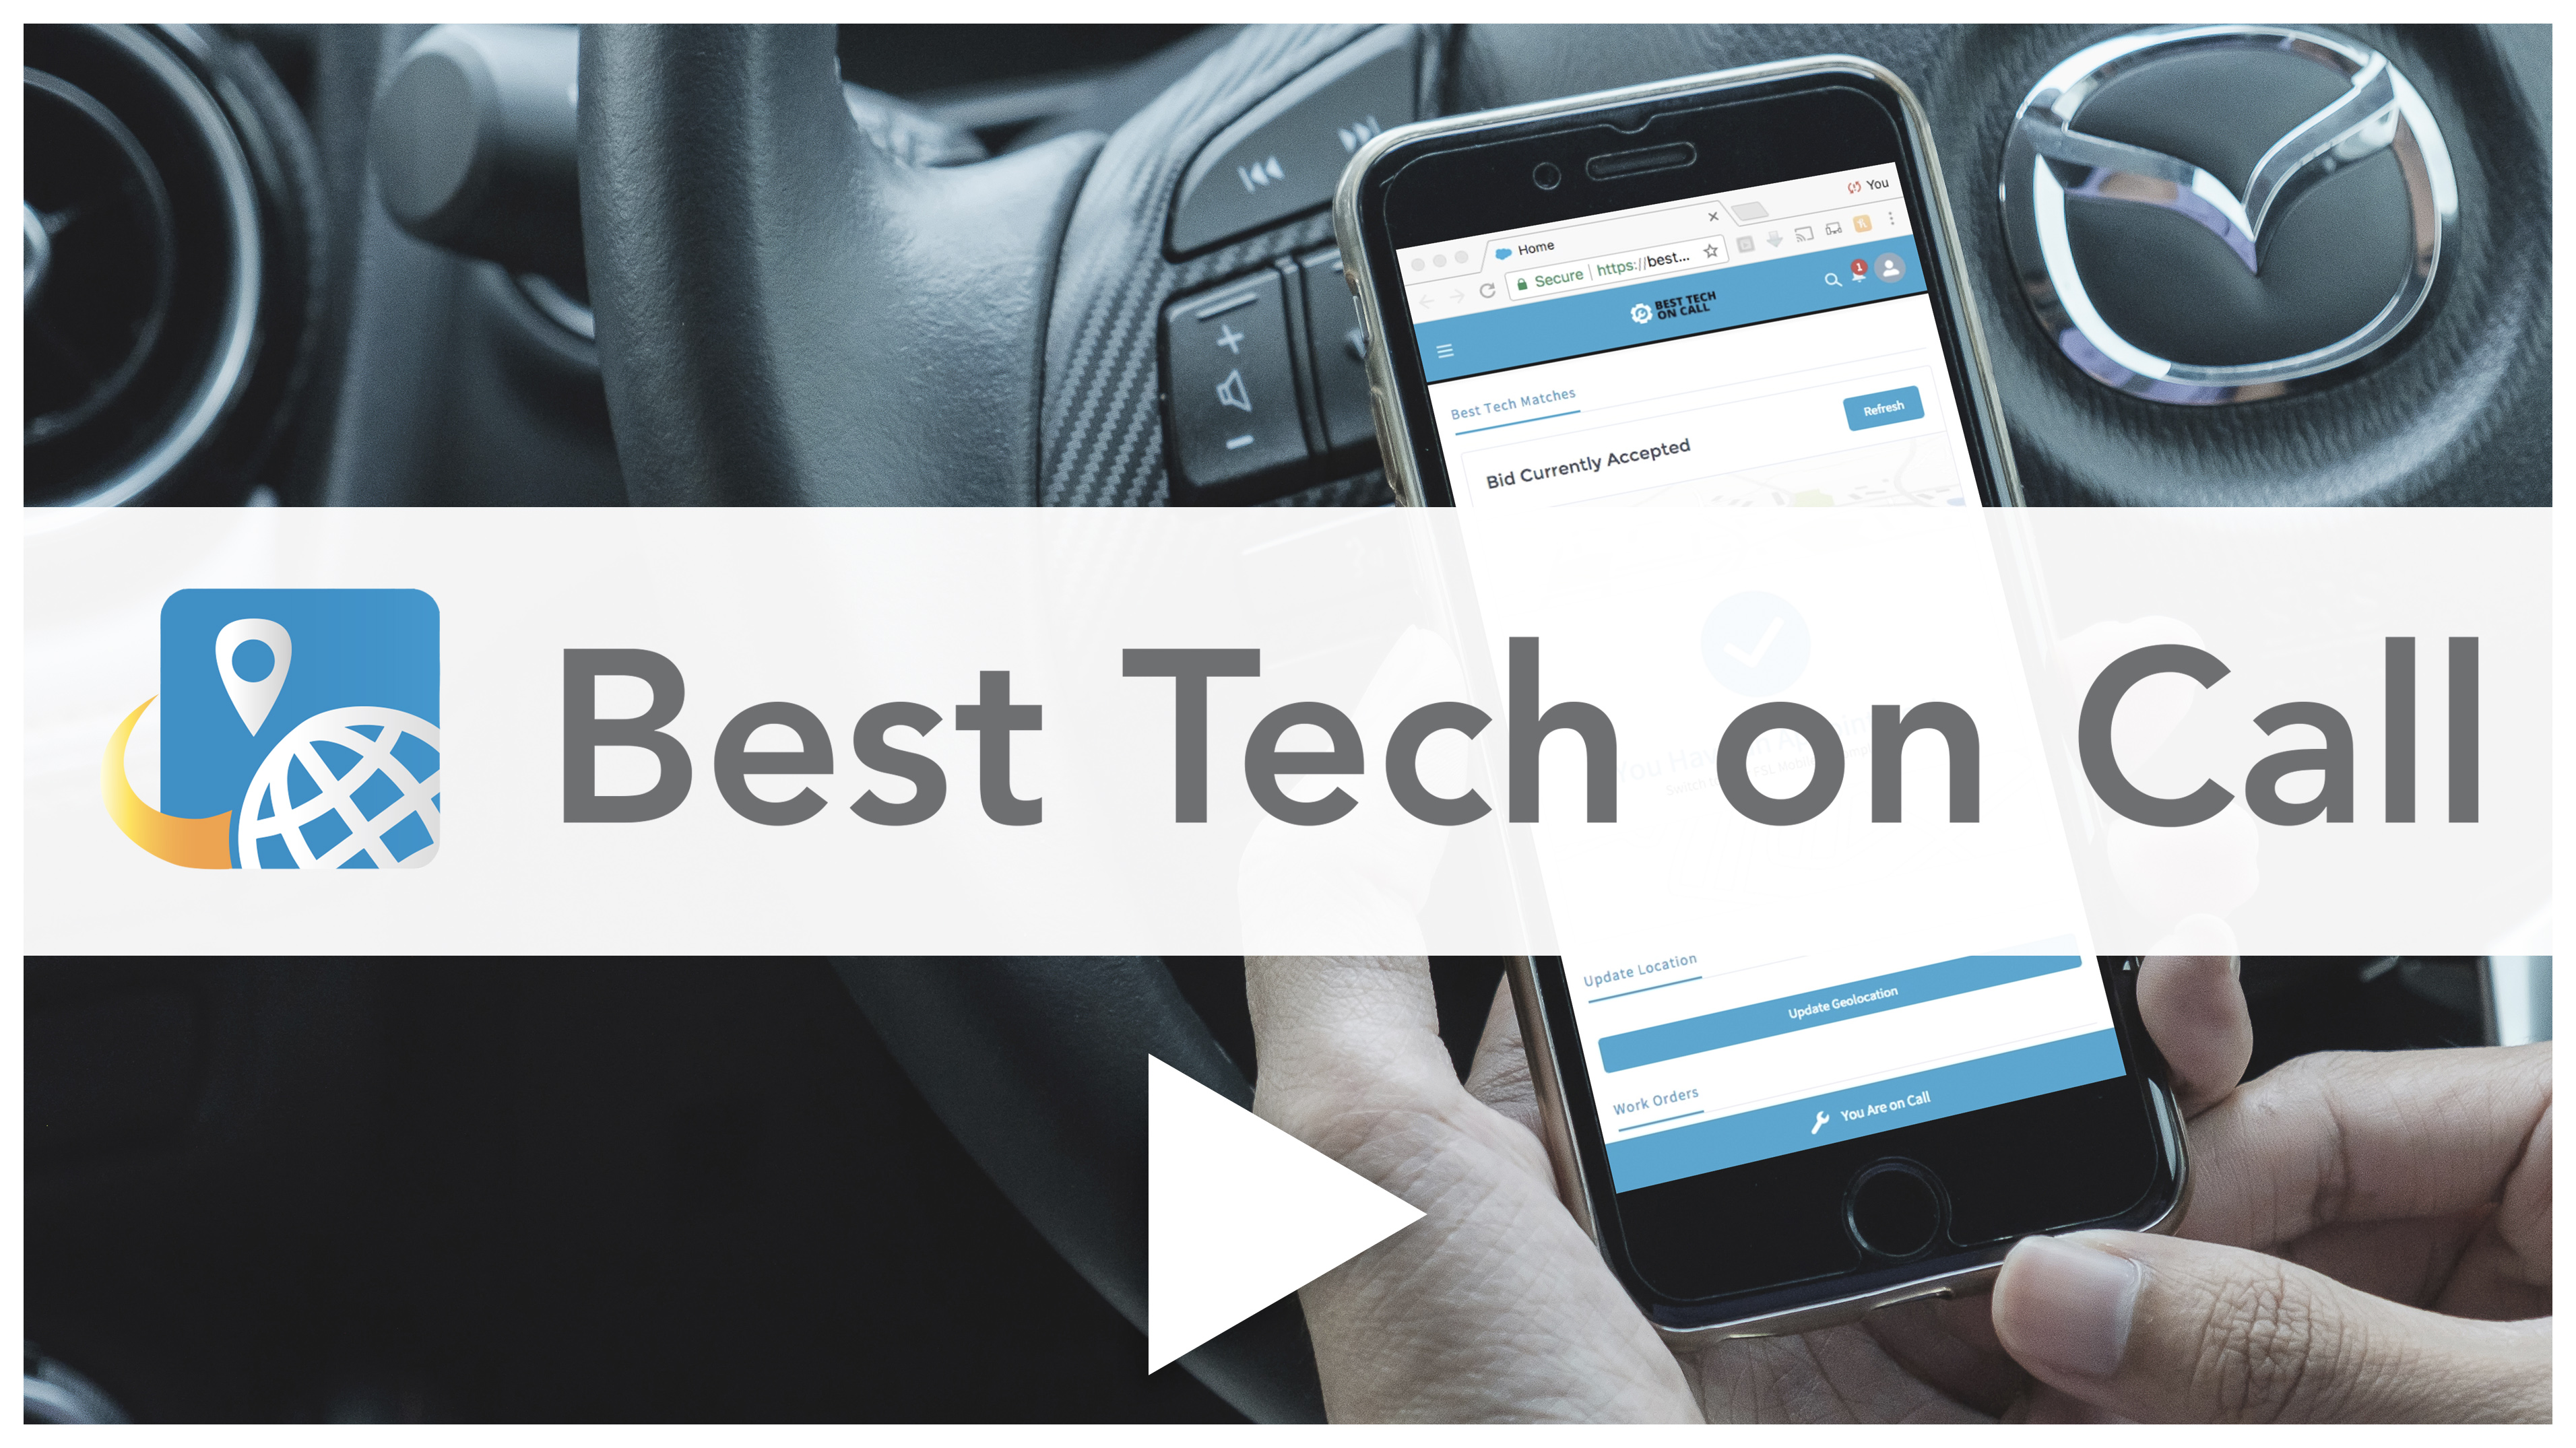 Play Best Tech on Call Video